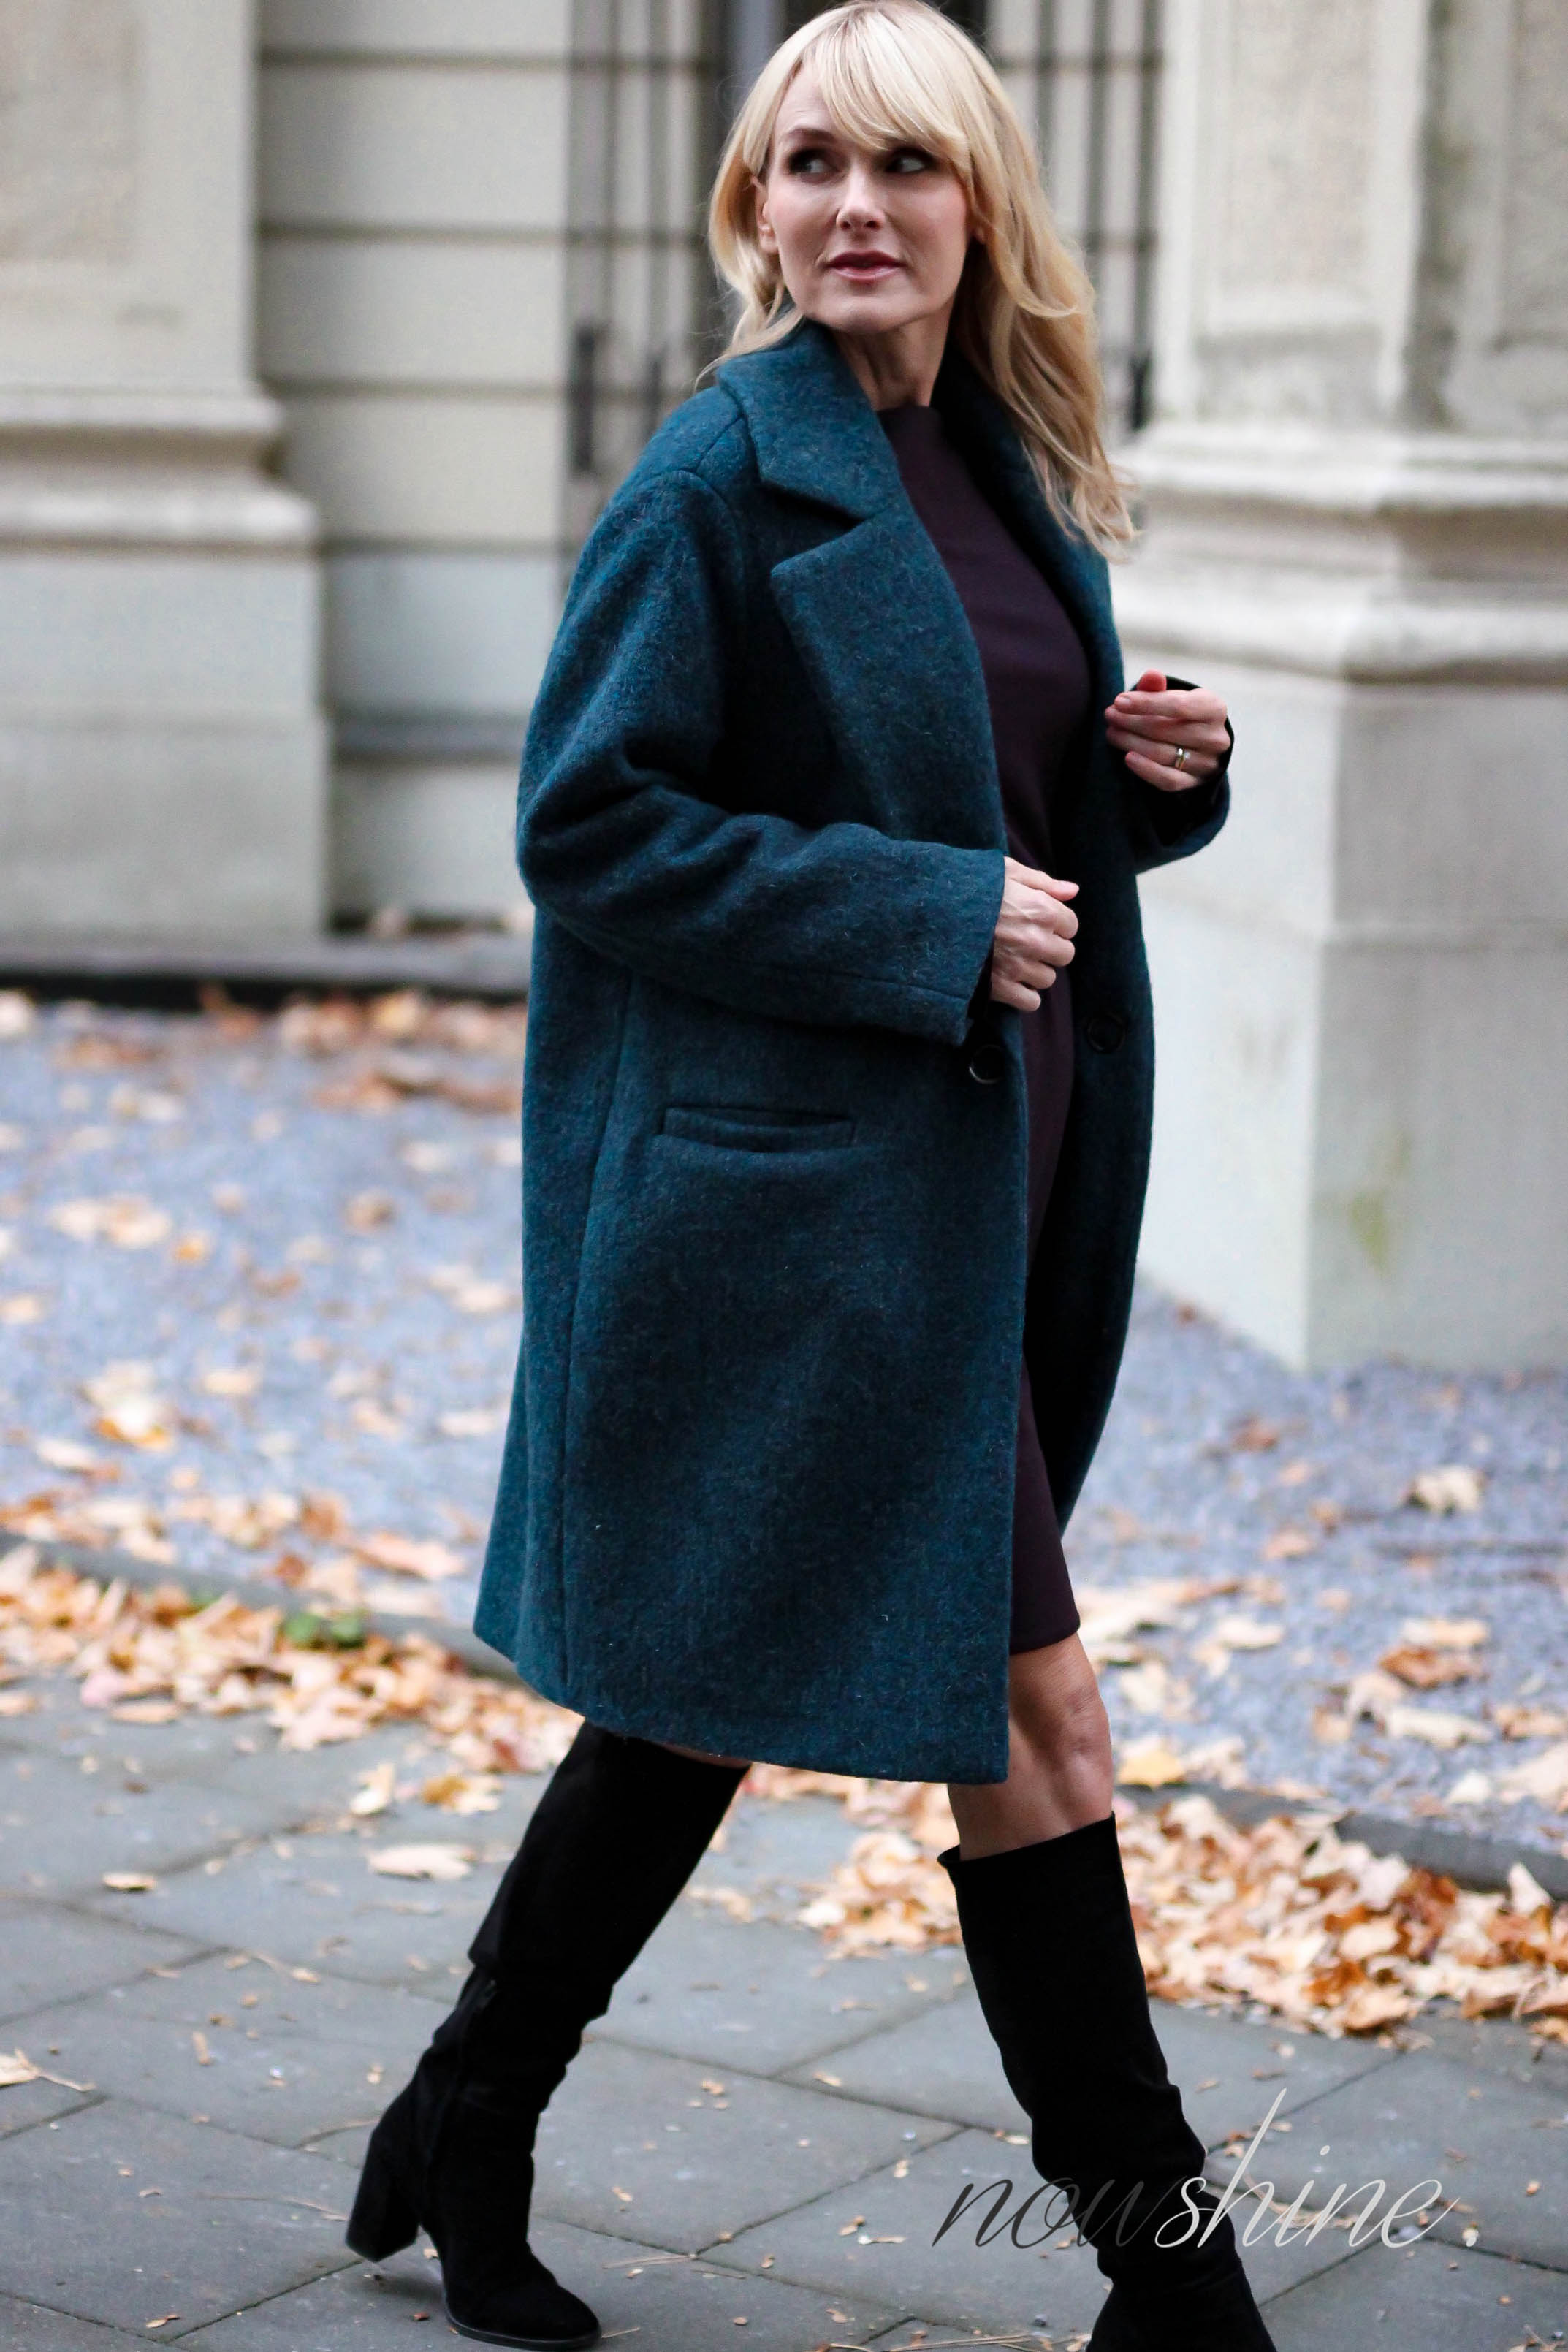 Blazermantel im Oversized-Look von Bonita - Capsule Wardrobe Wintermantel